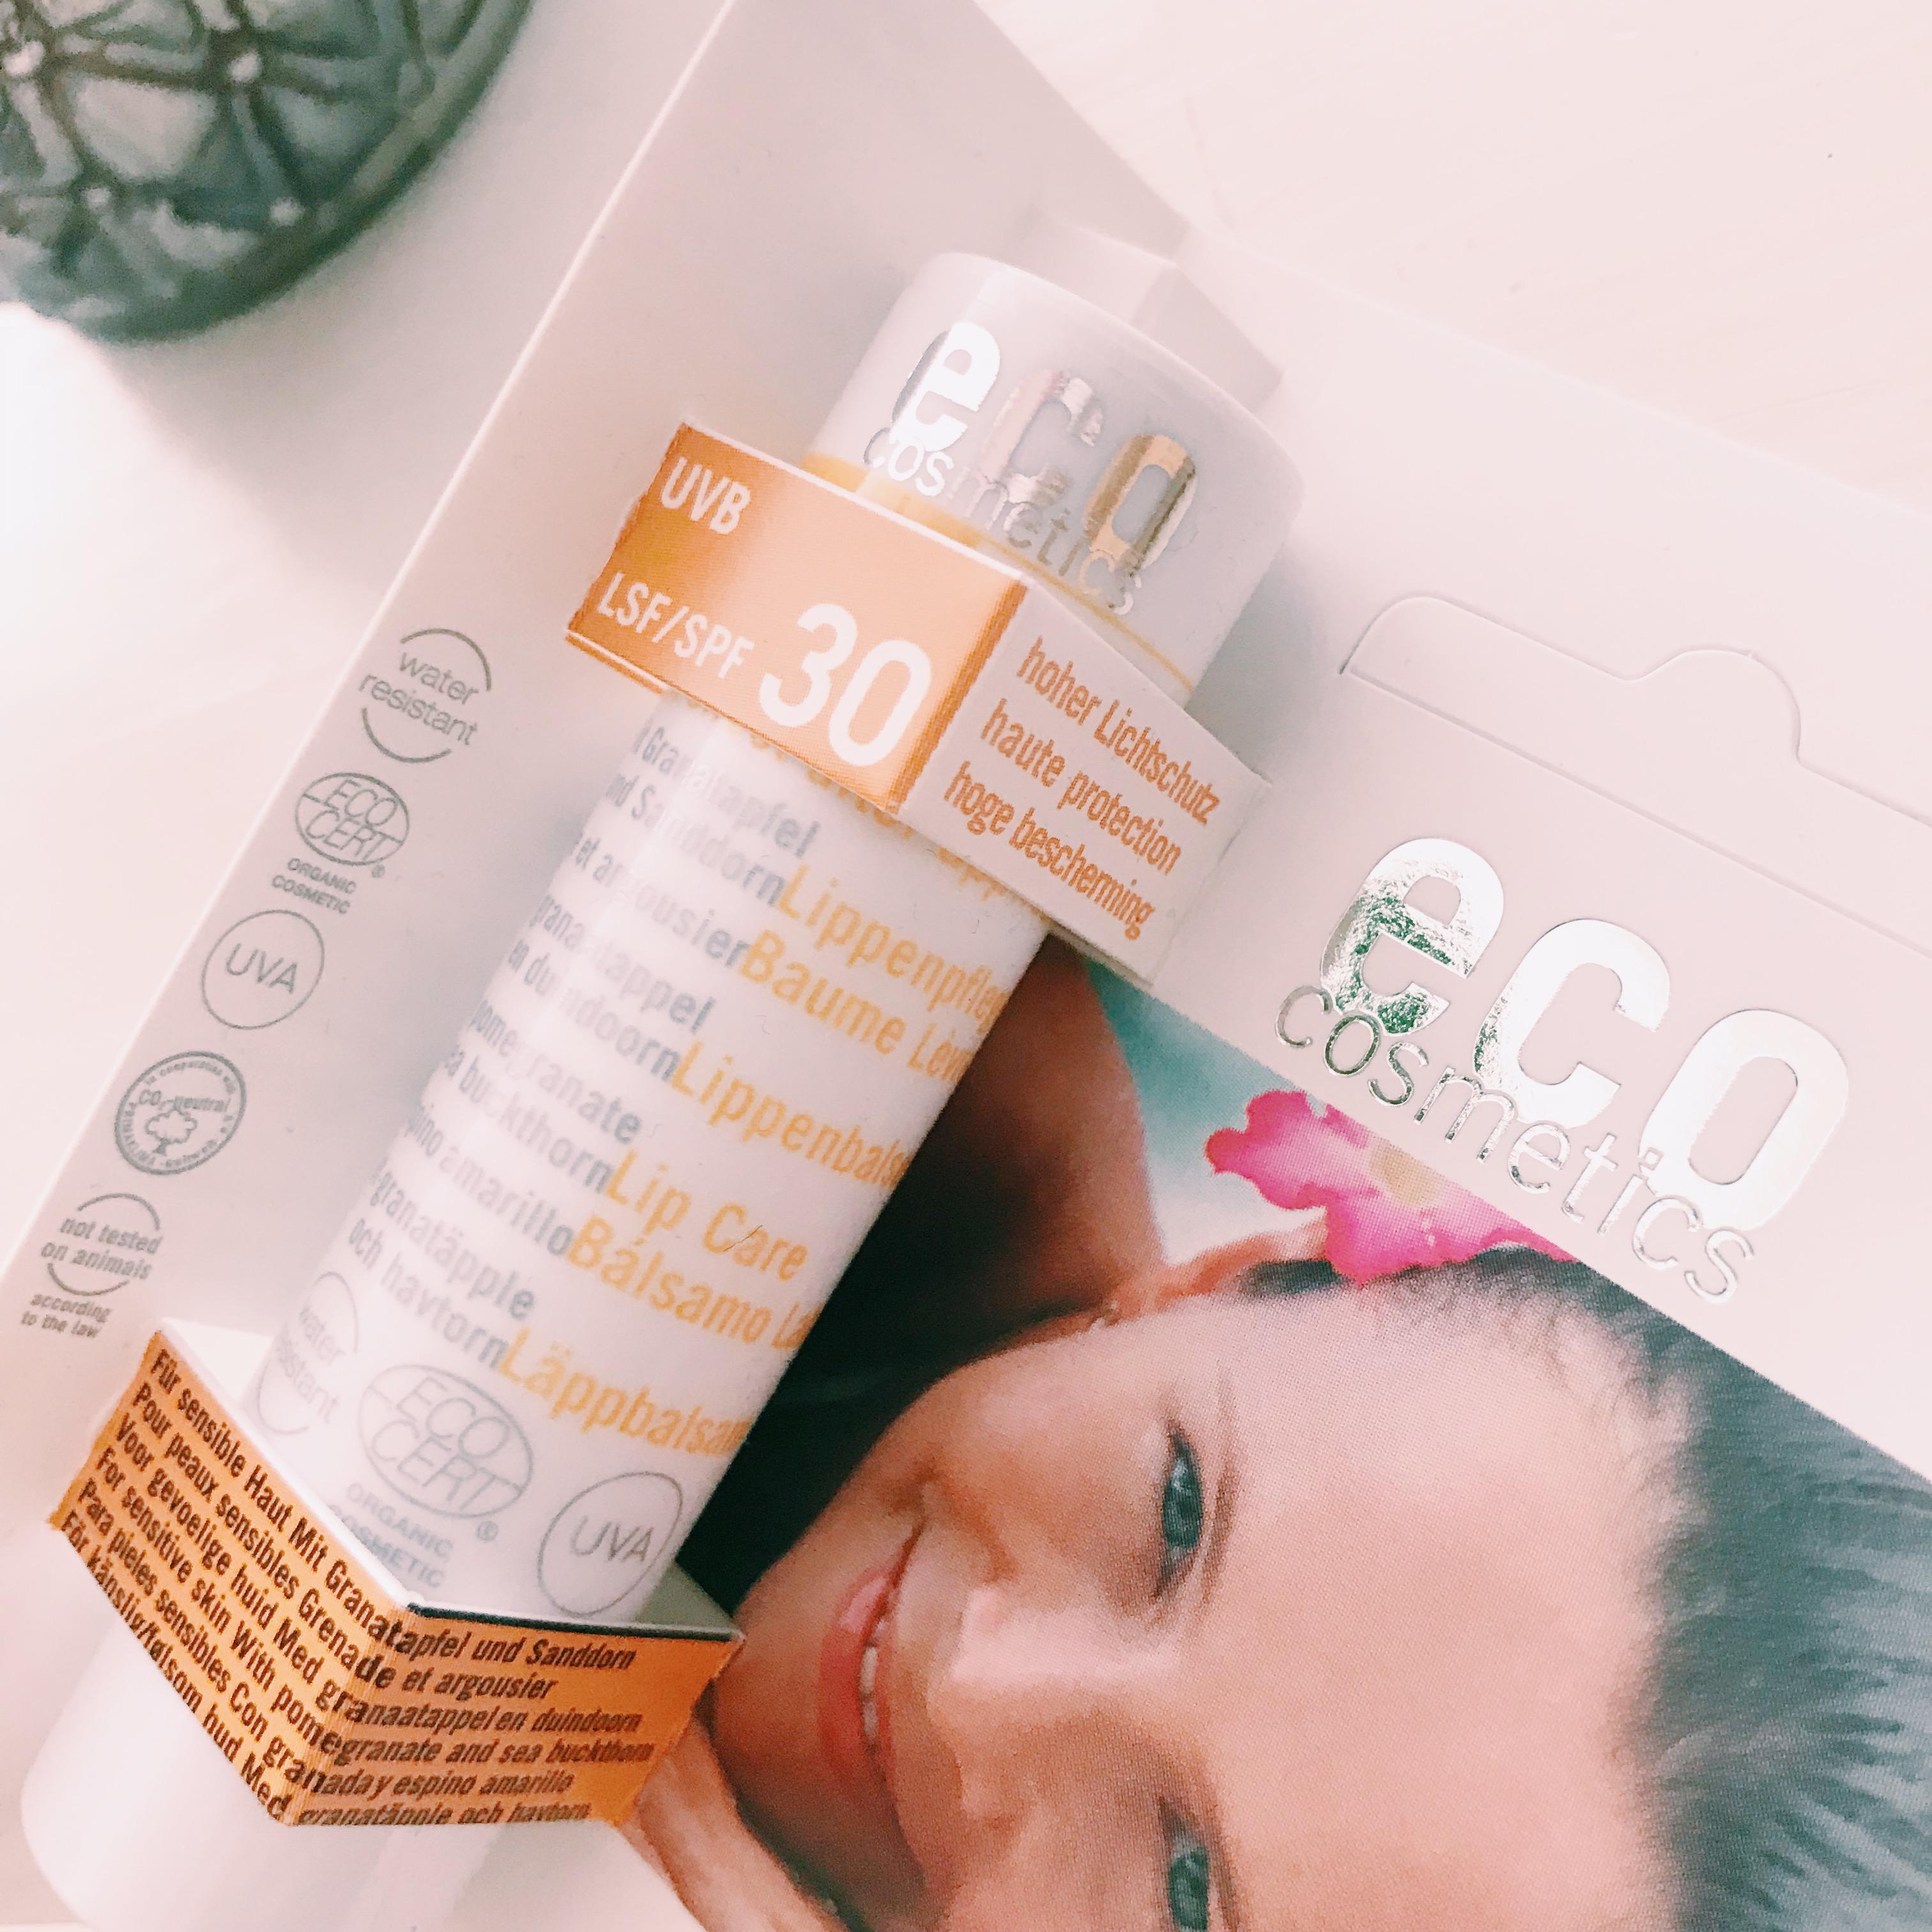 Lip balm - Eco cosmetics